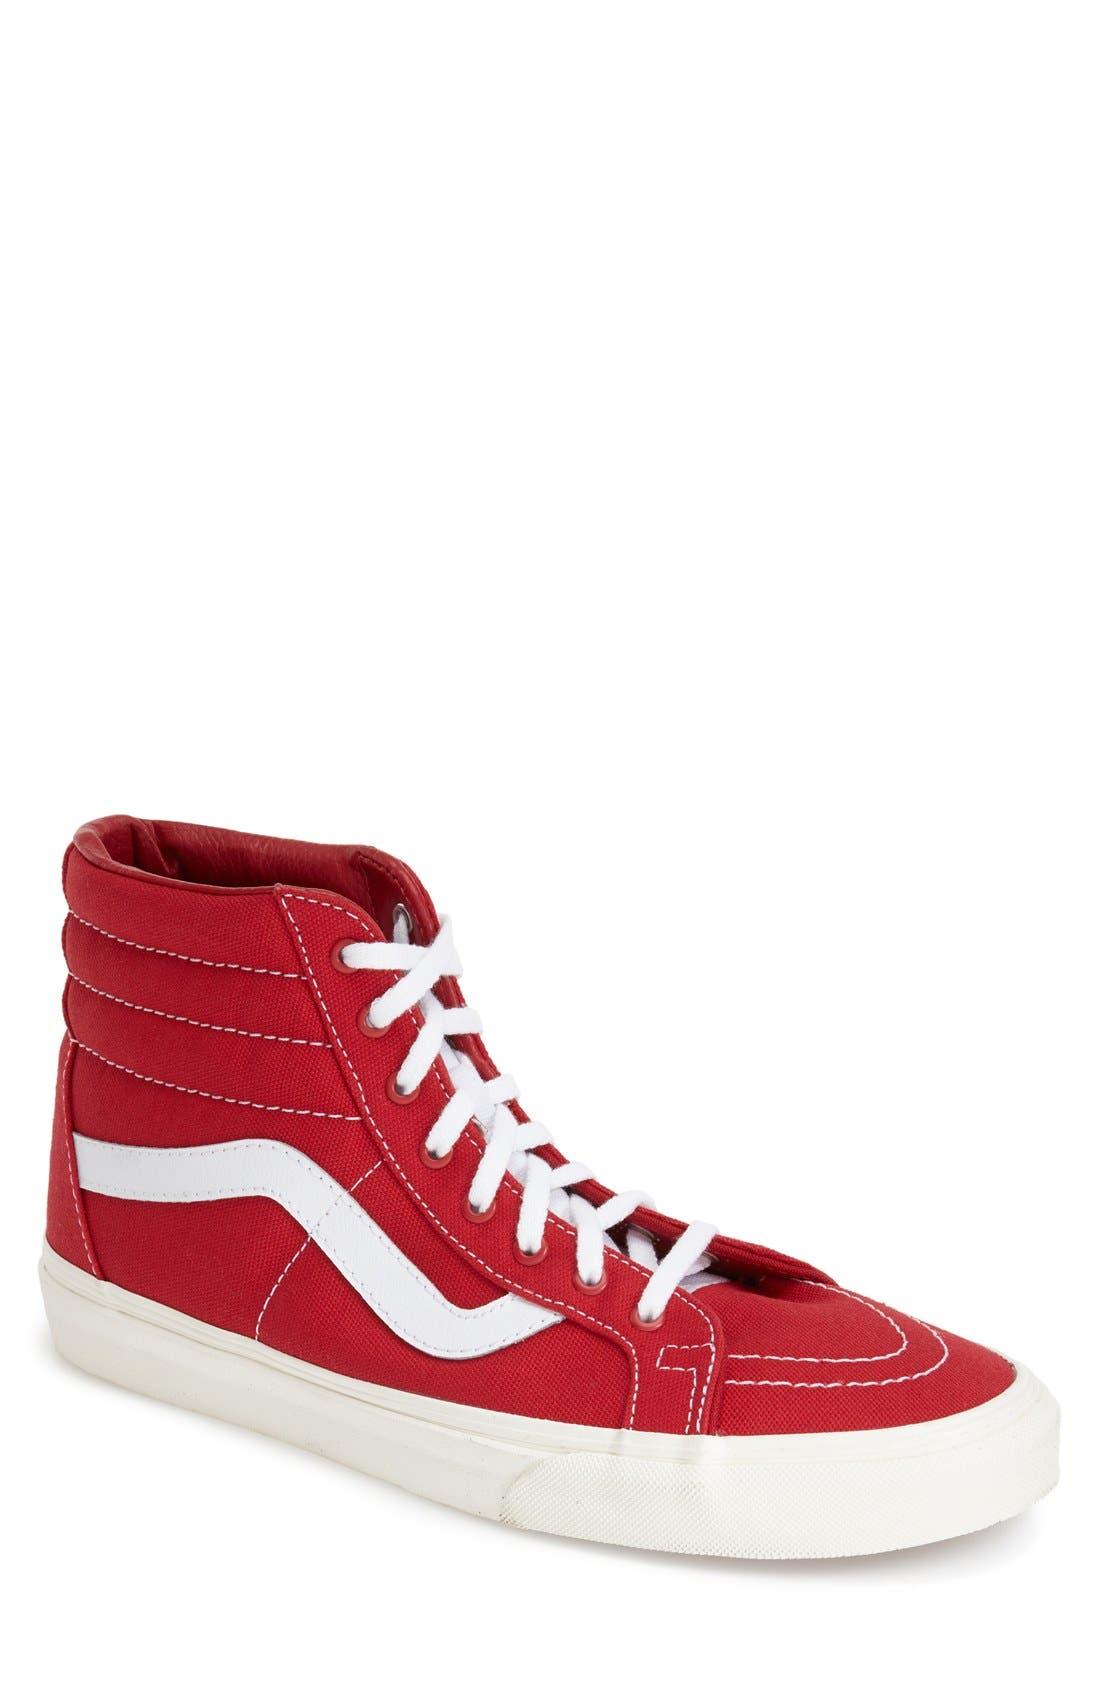 Alternate Image 1 Selected - Vans 'Sk8-Hi Reissue' Sneaker (Men)